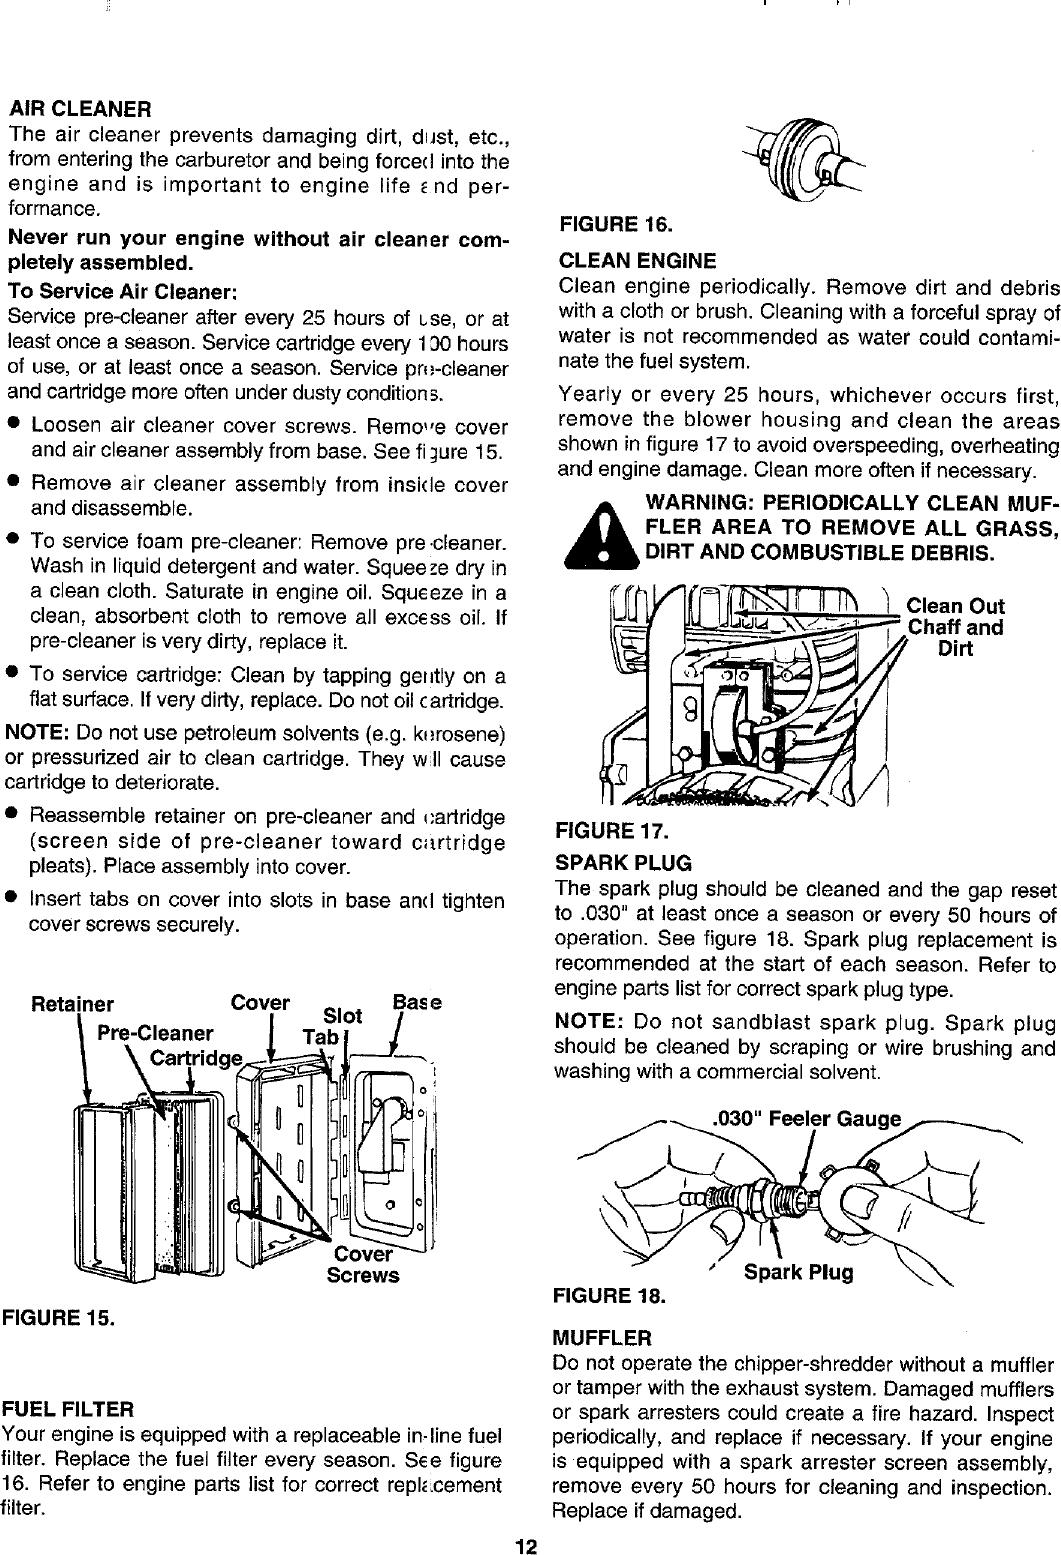 Craftsman 247795950 User Manual CHIPPER SHREDDER Manuals And